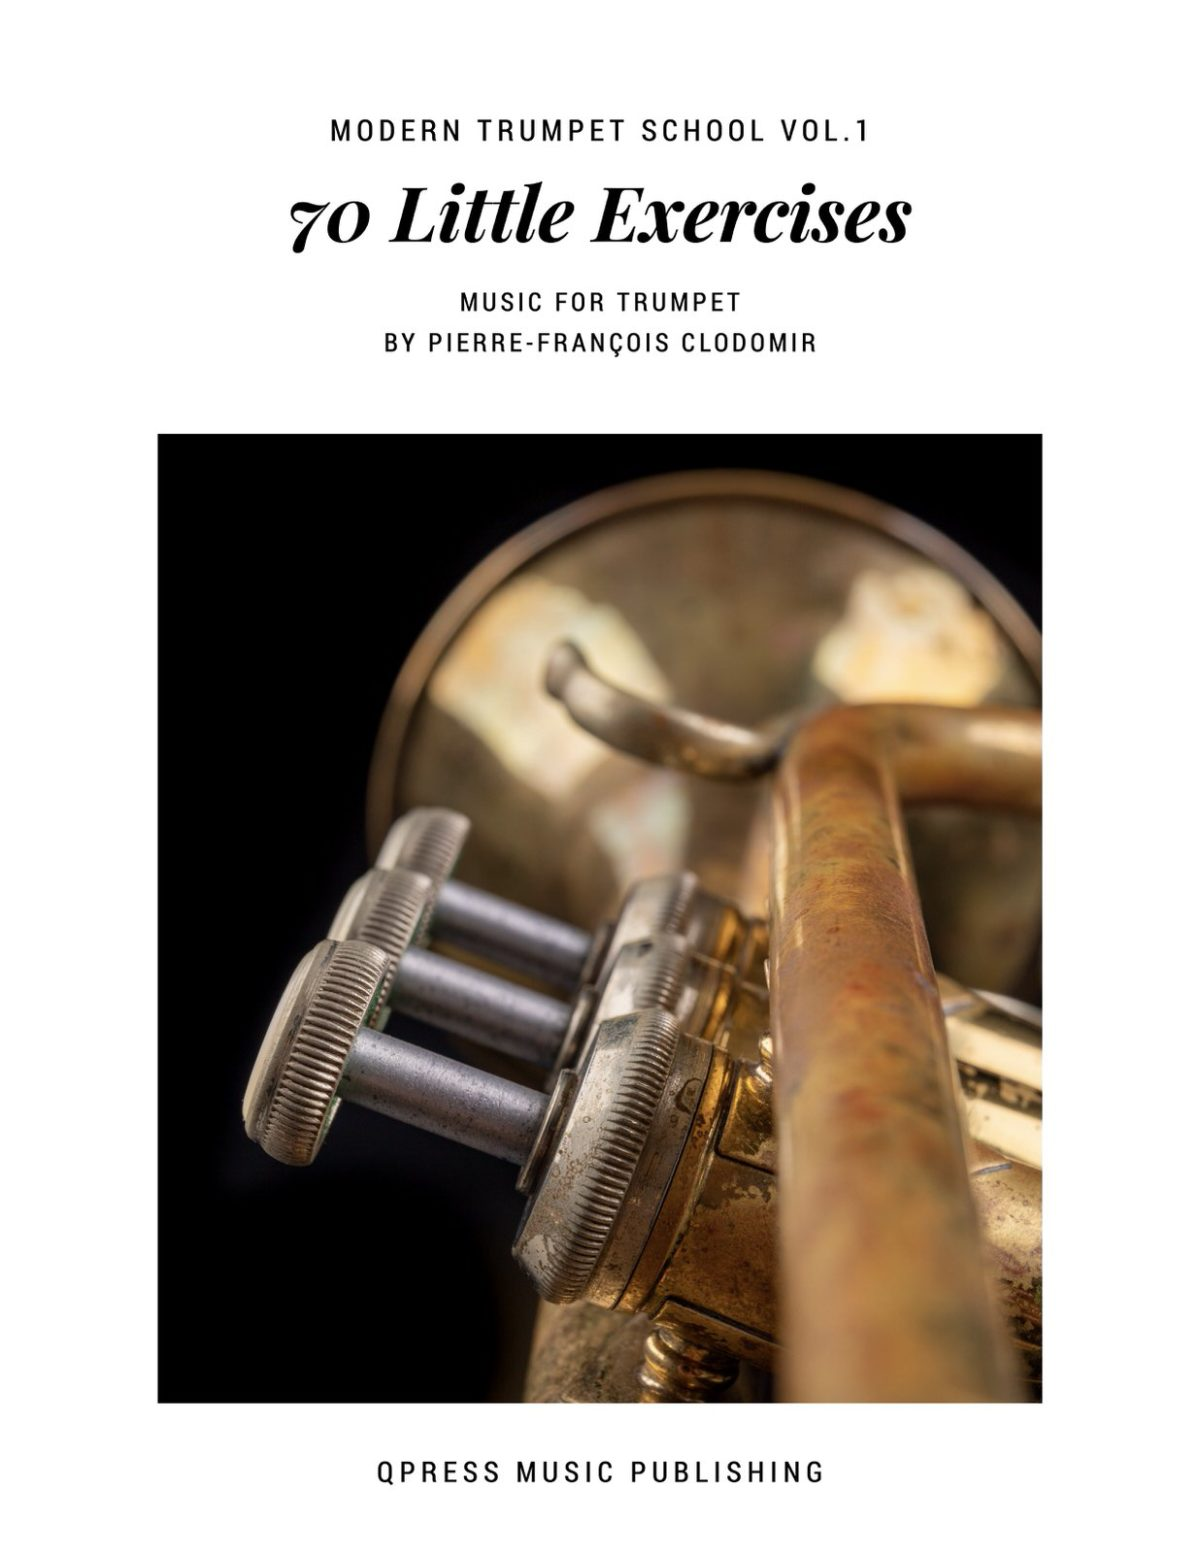 Clodomir, Modern Trumpet School 1, Little Exercises-p01